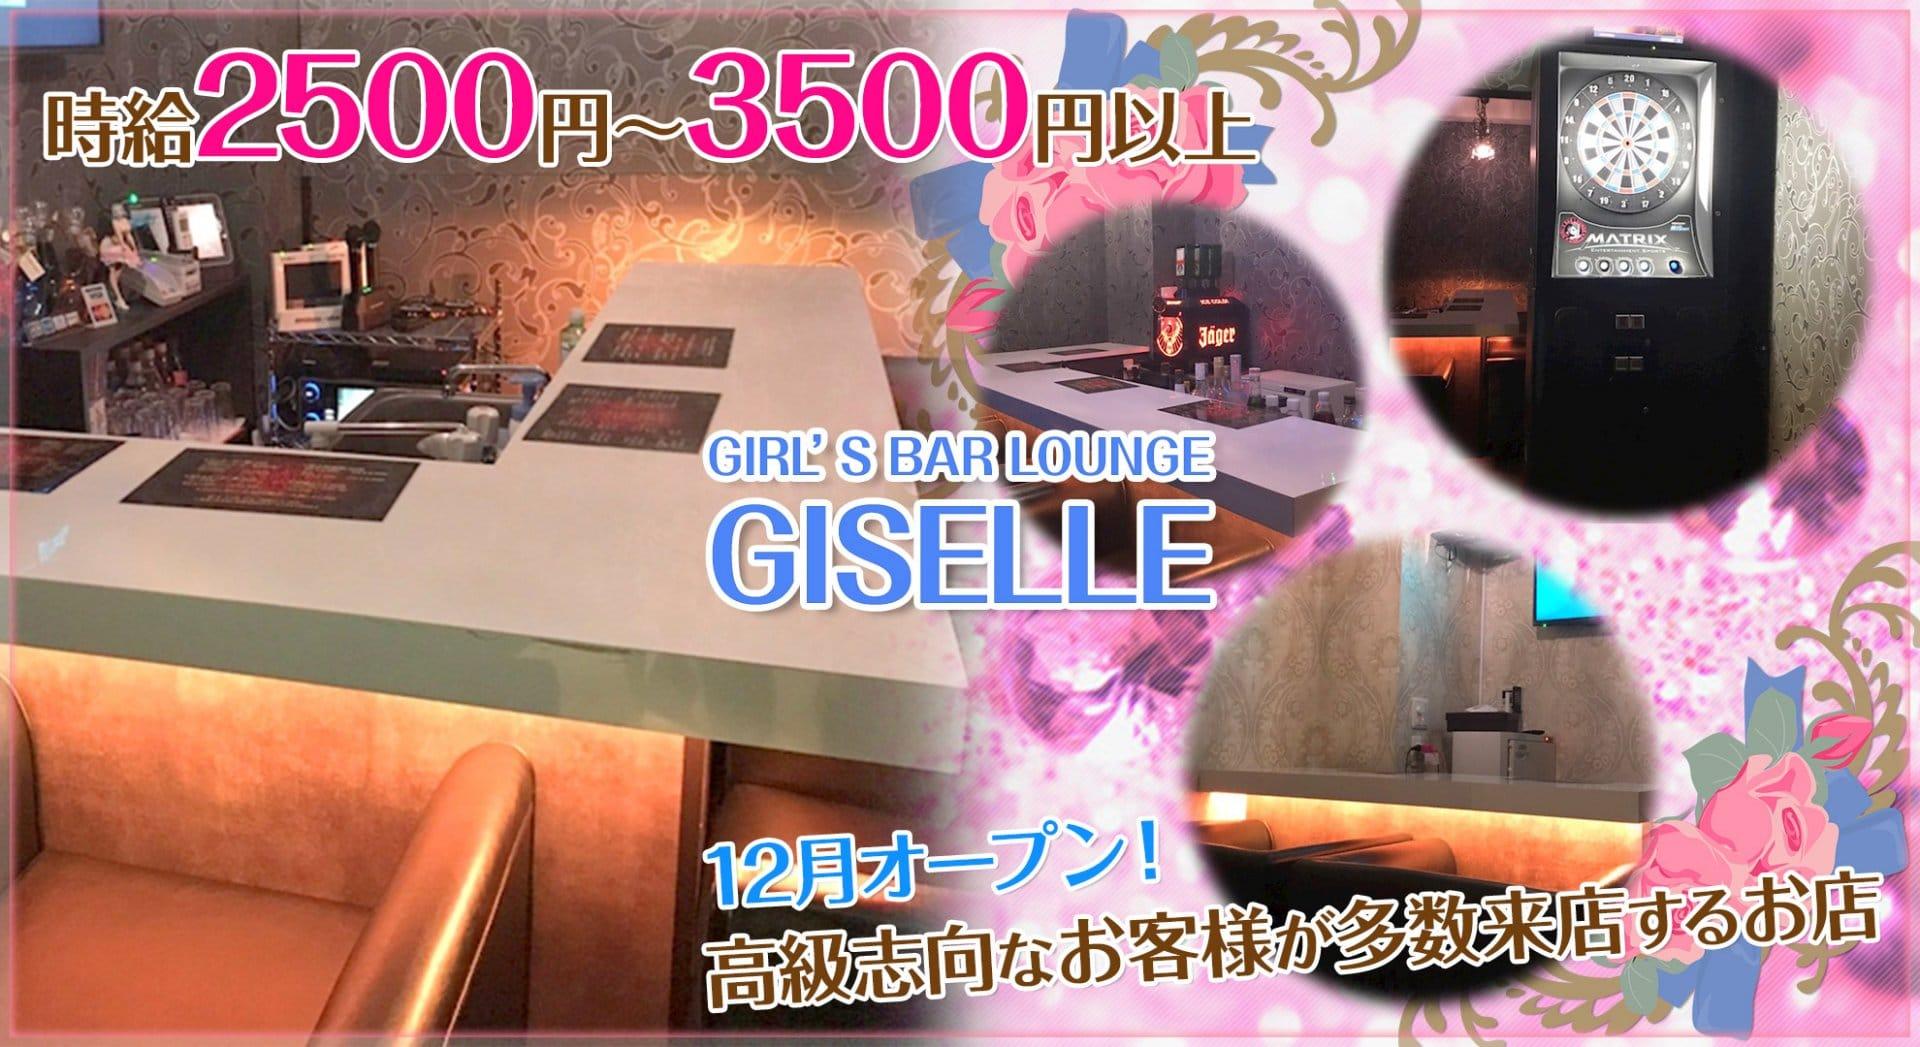 GISELLE (ジゼル) TOP画像